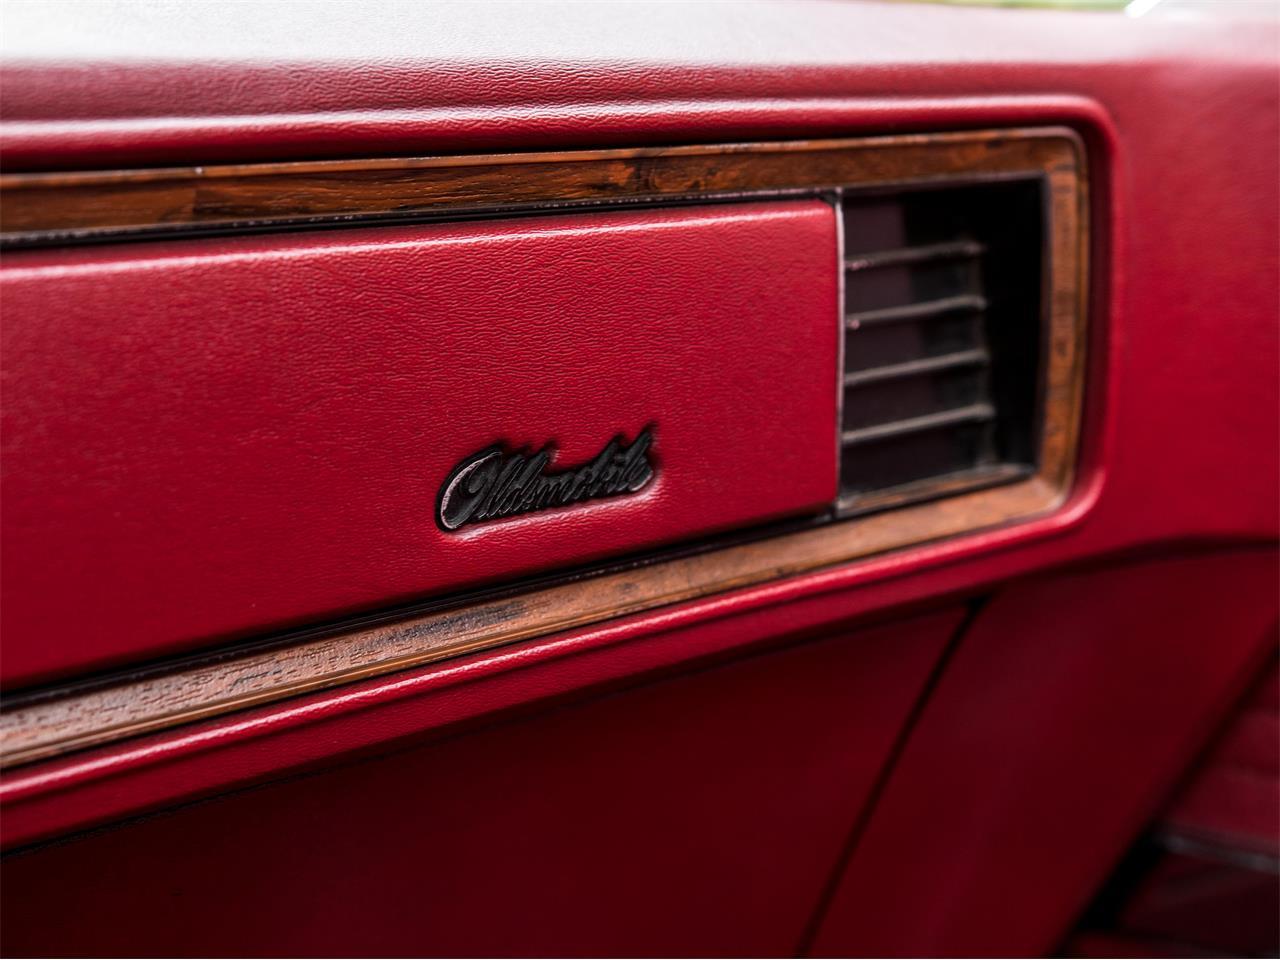 1973 Oldsmobile Delta 88 (CC-1380977) for sale in Kelowna, British Columbia